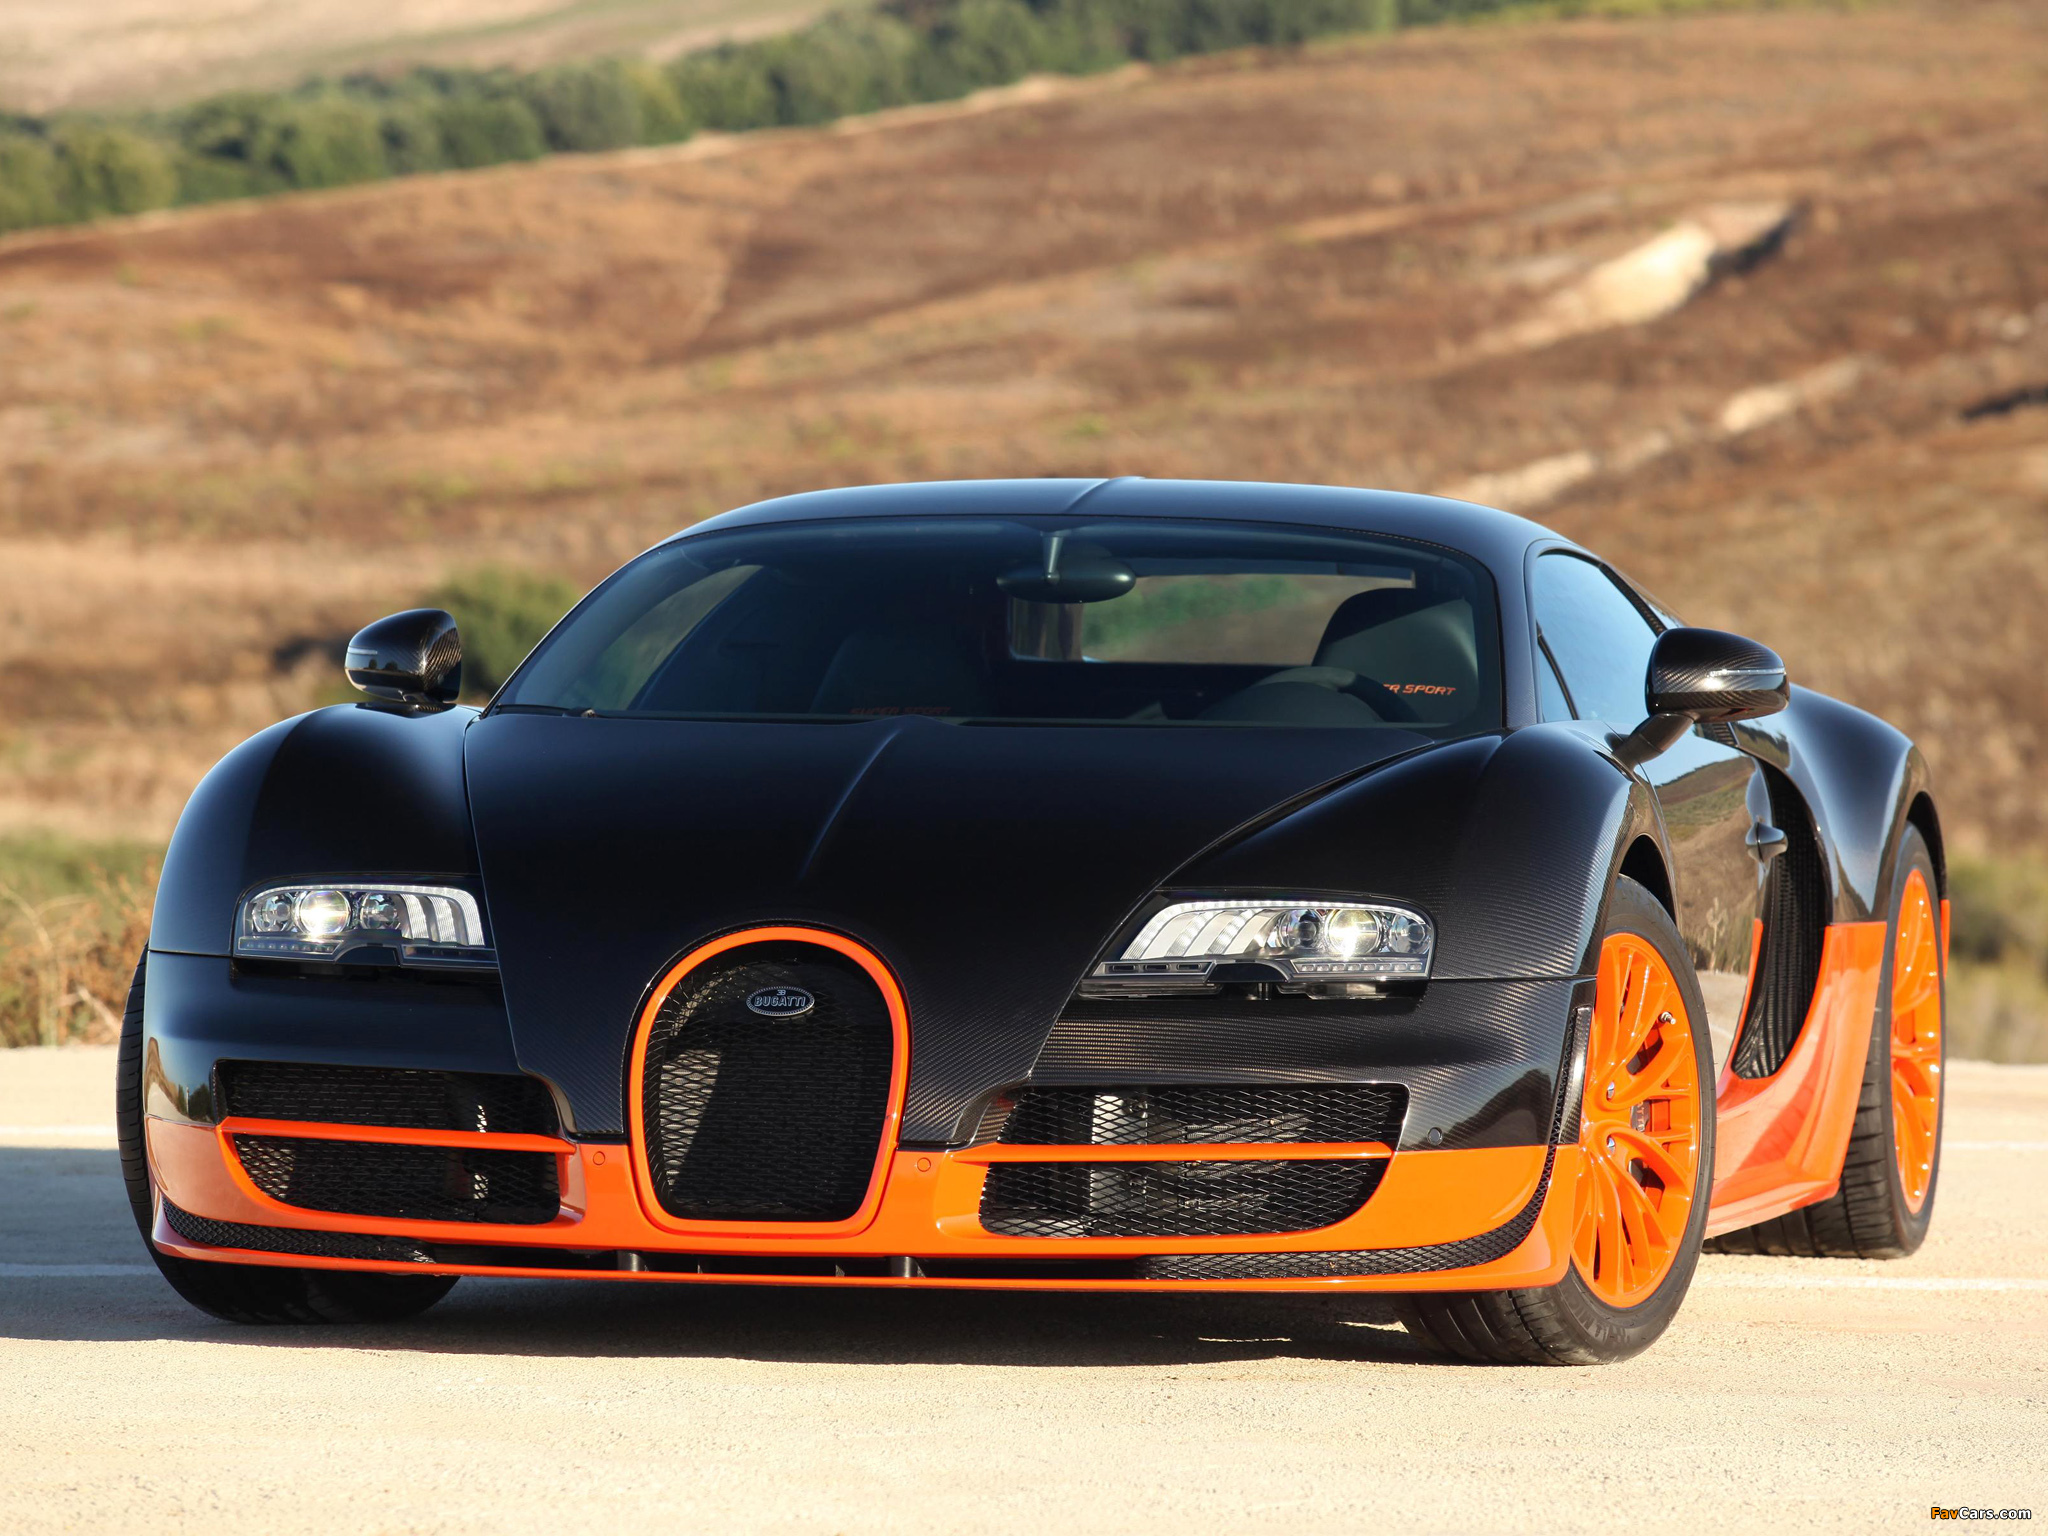 Bugatti Veyron 16 4 Super Sport 2010 Images 2048x1536